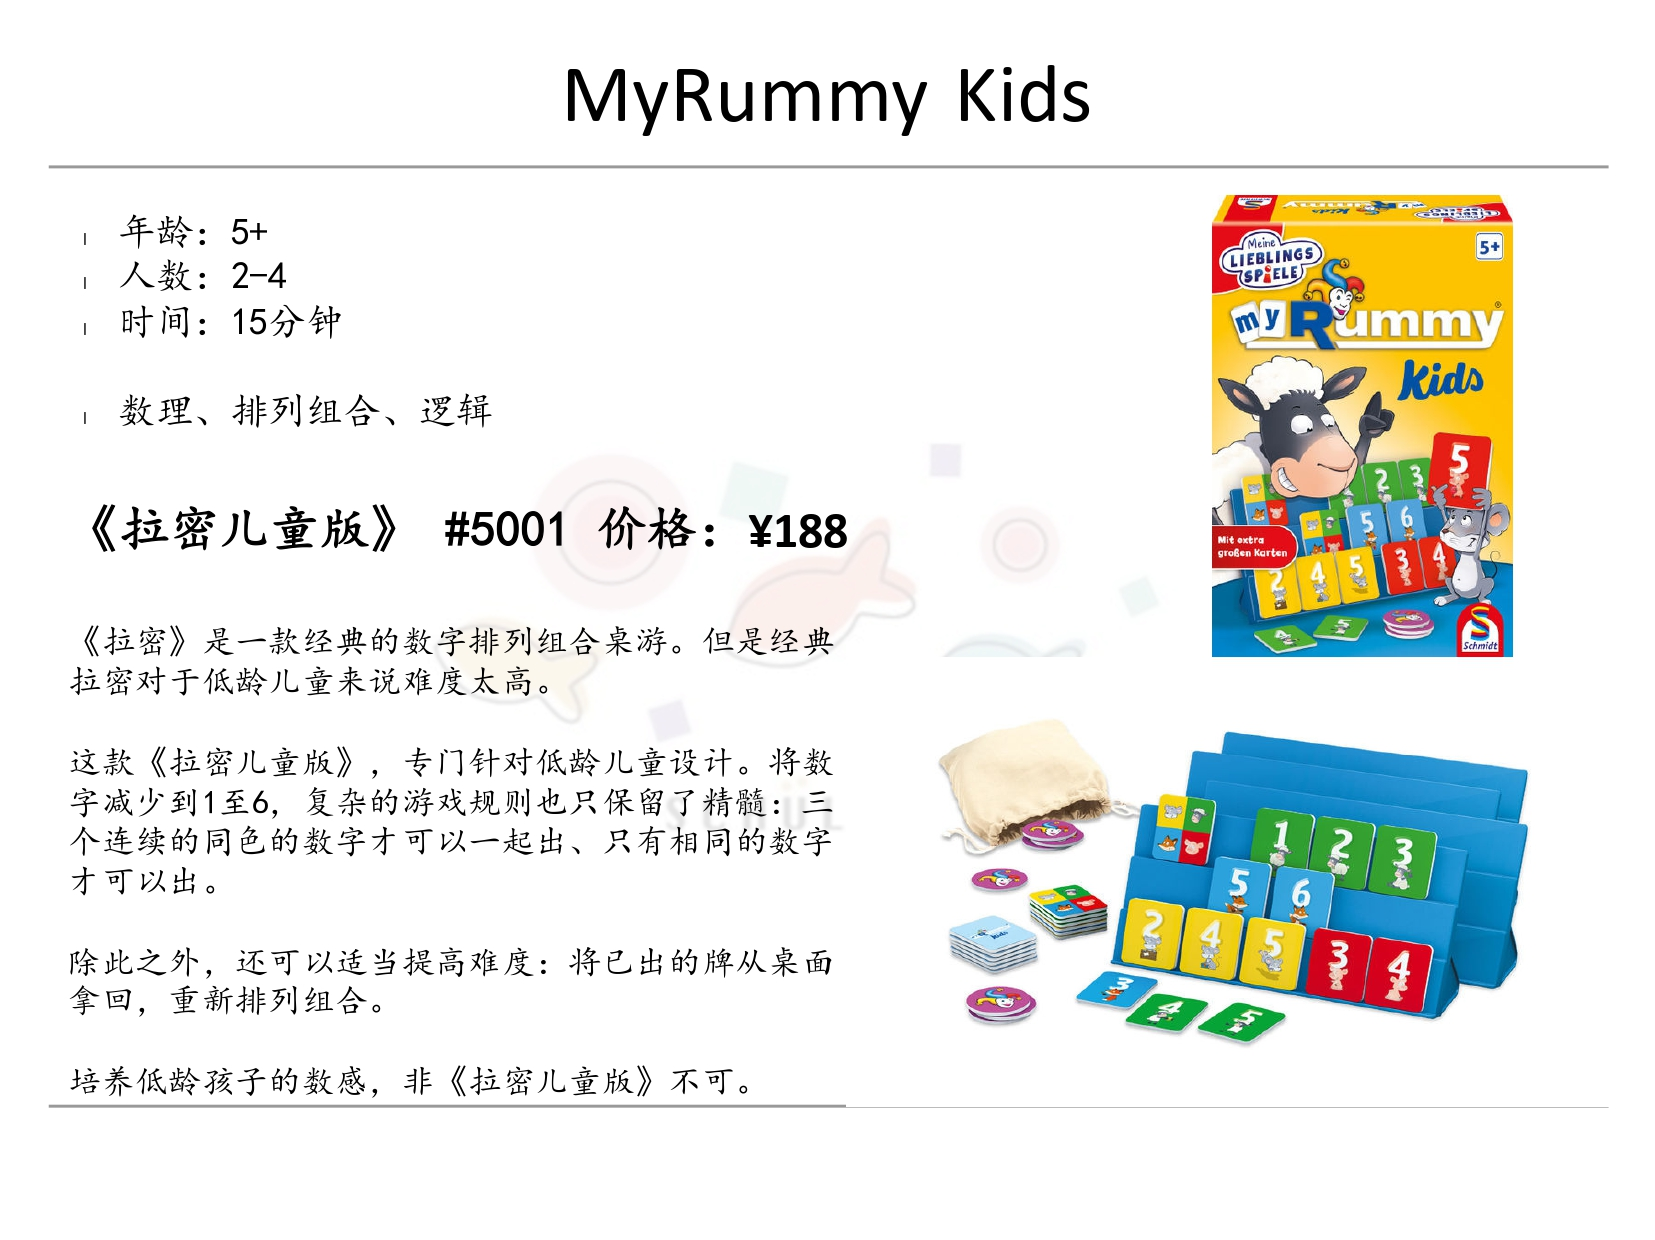 MyRummy Kids 拉密儿童版